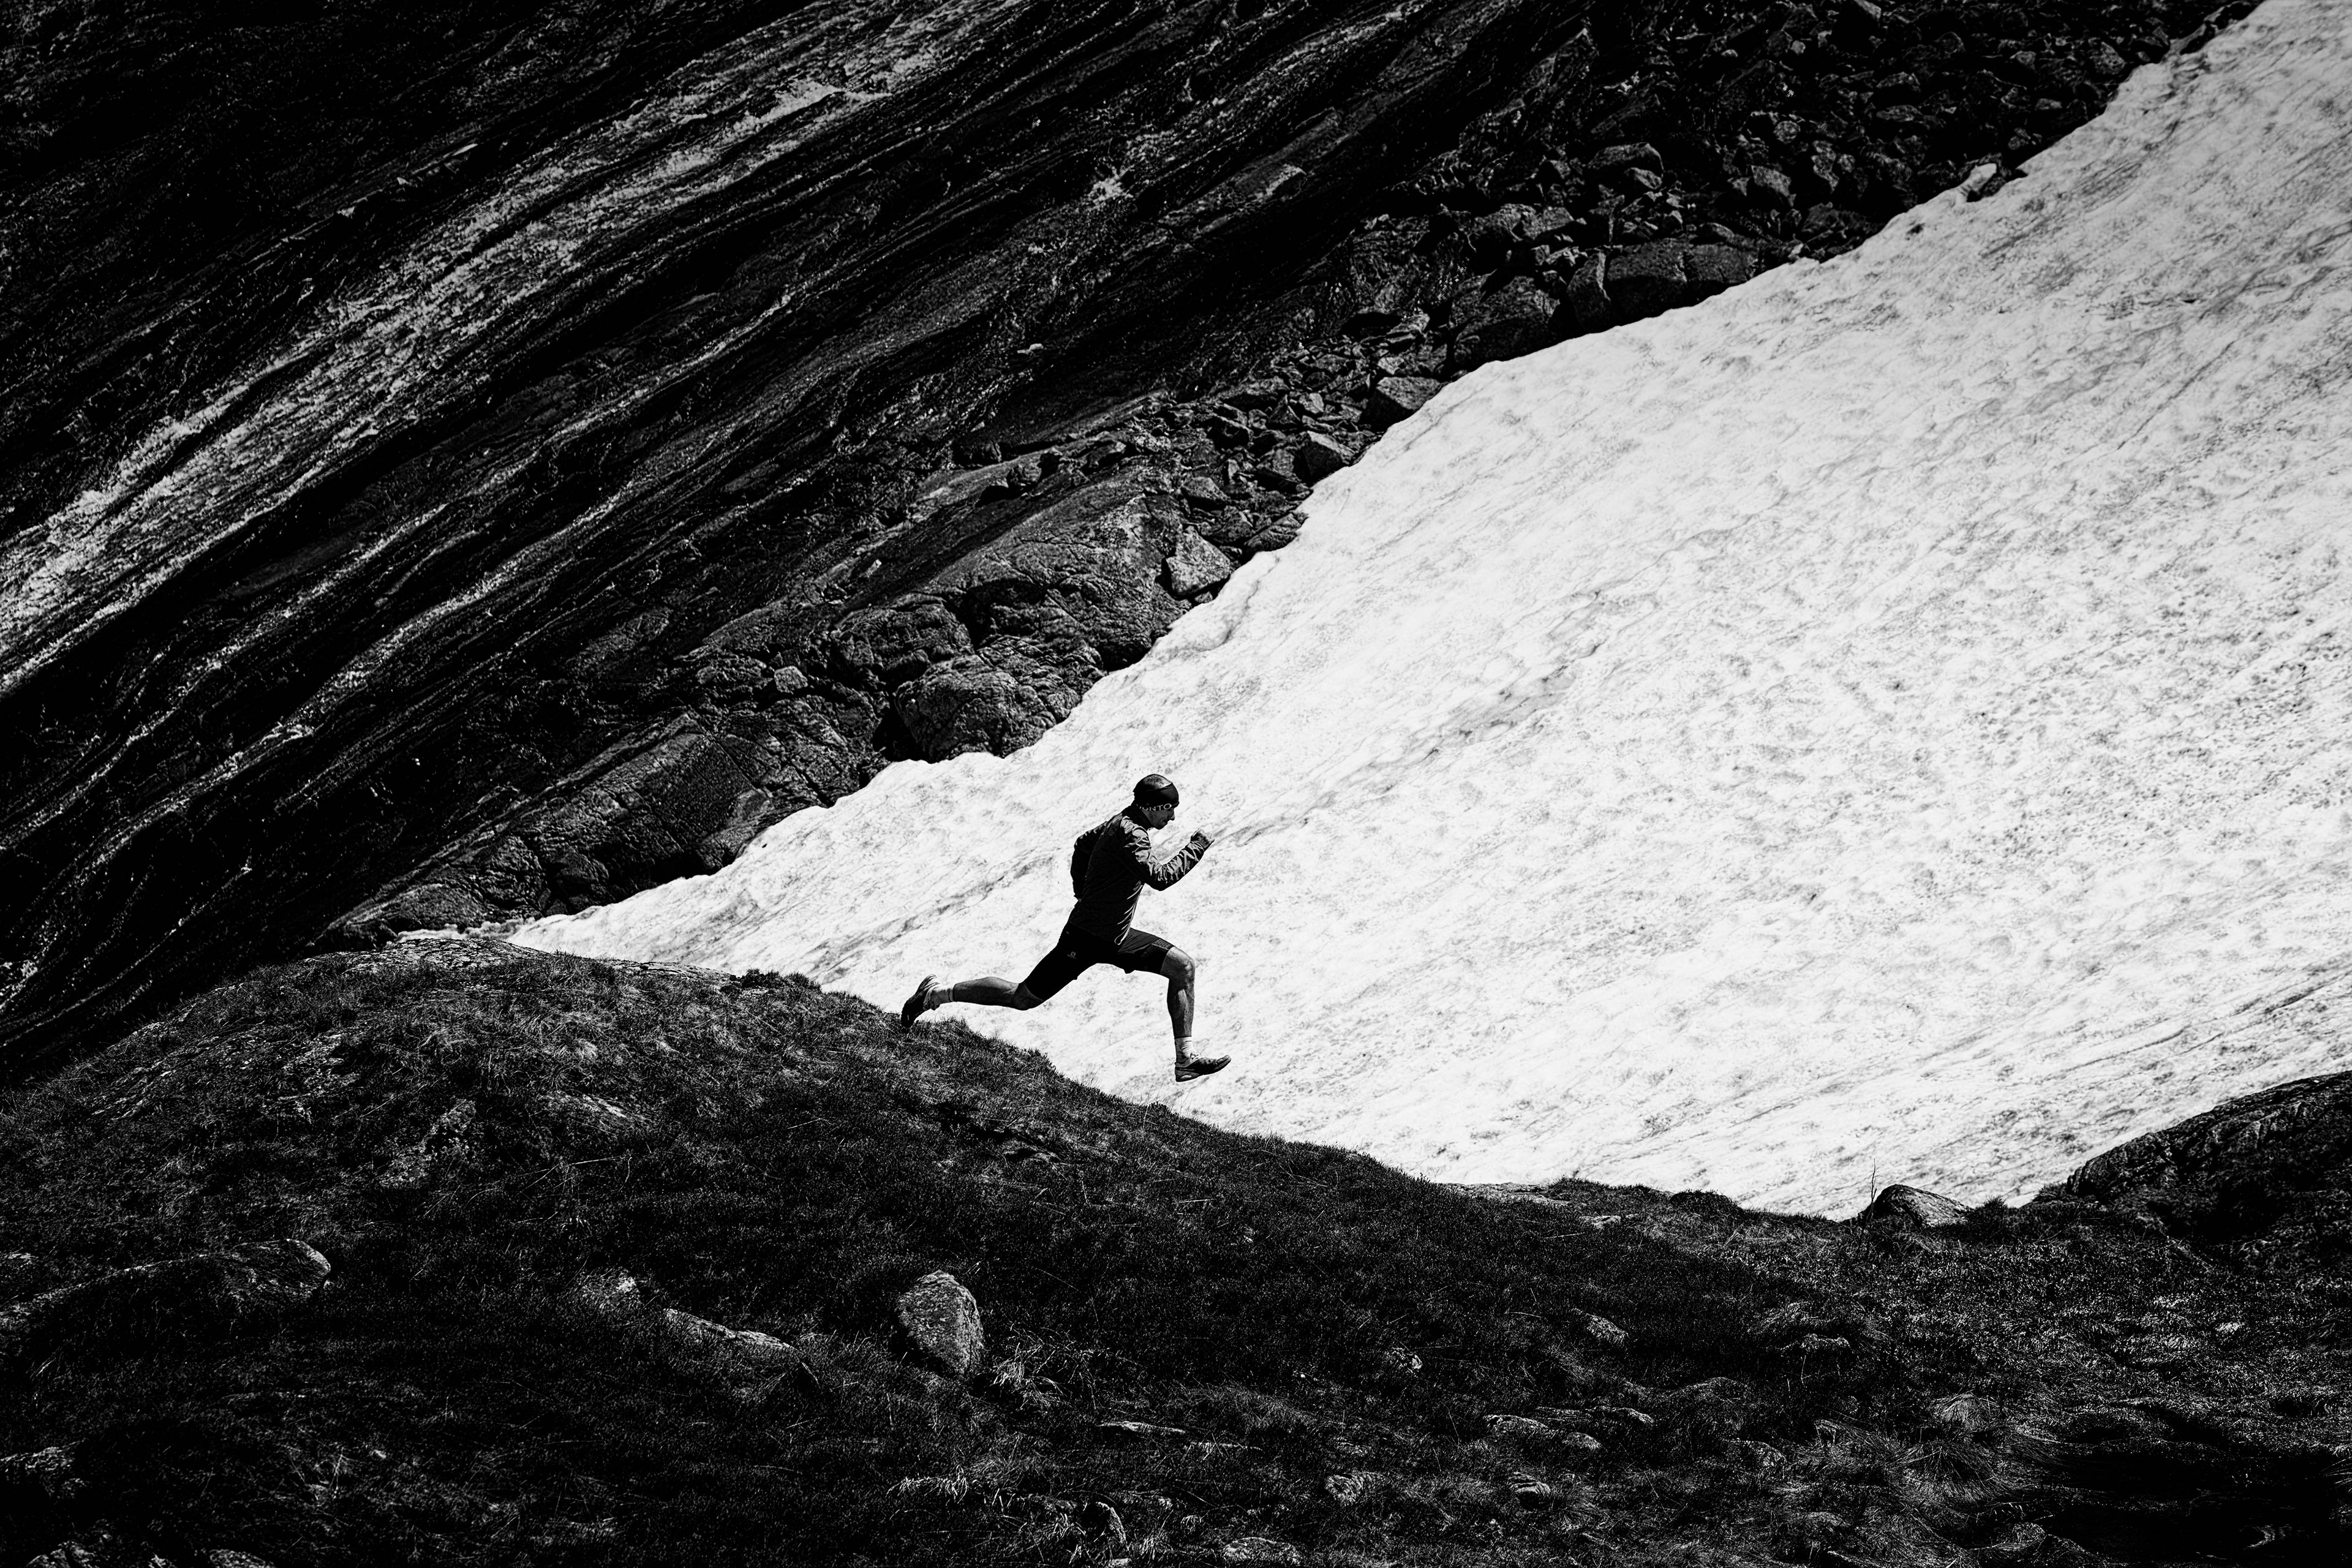 Marcin Świerc / Buff Pro Team / Tatra Mountains 2017